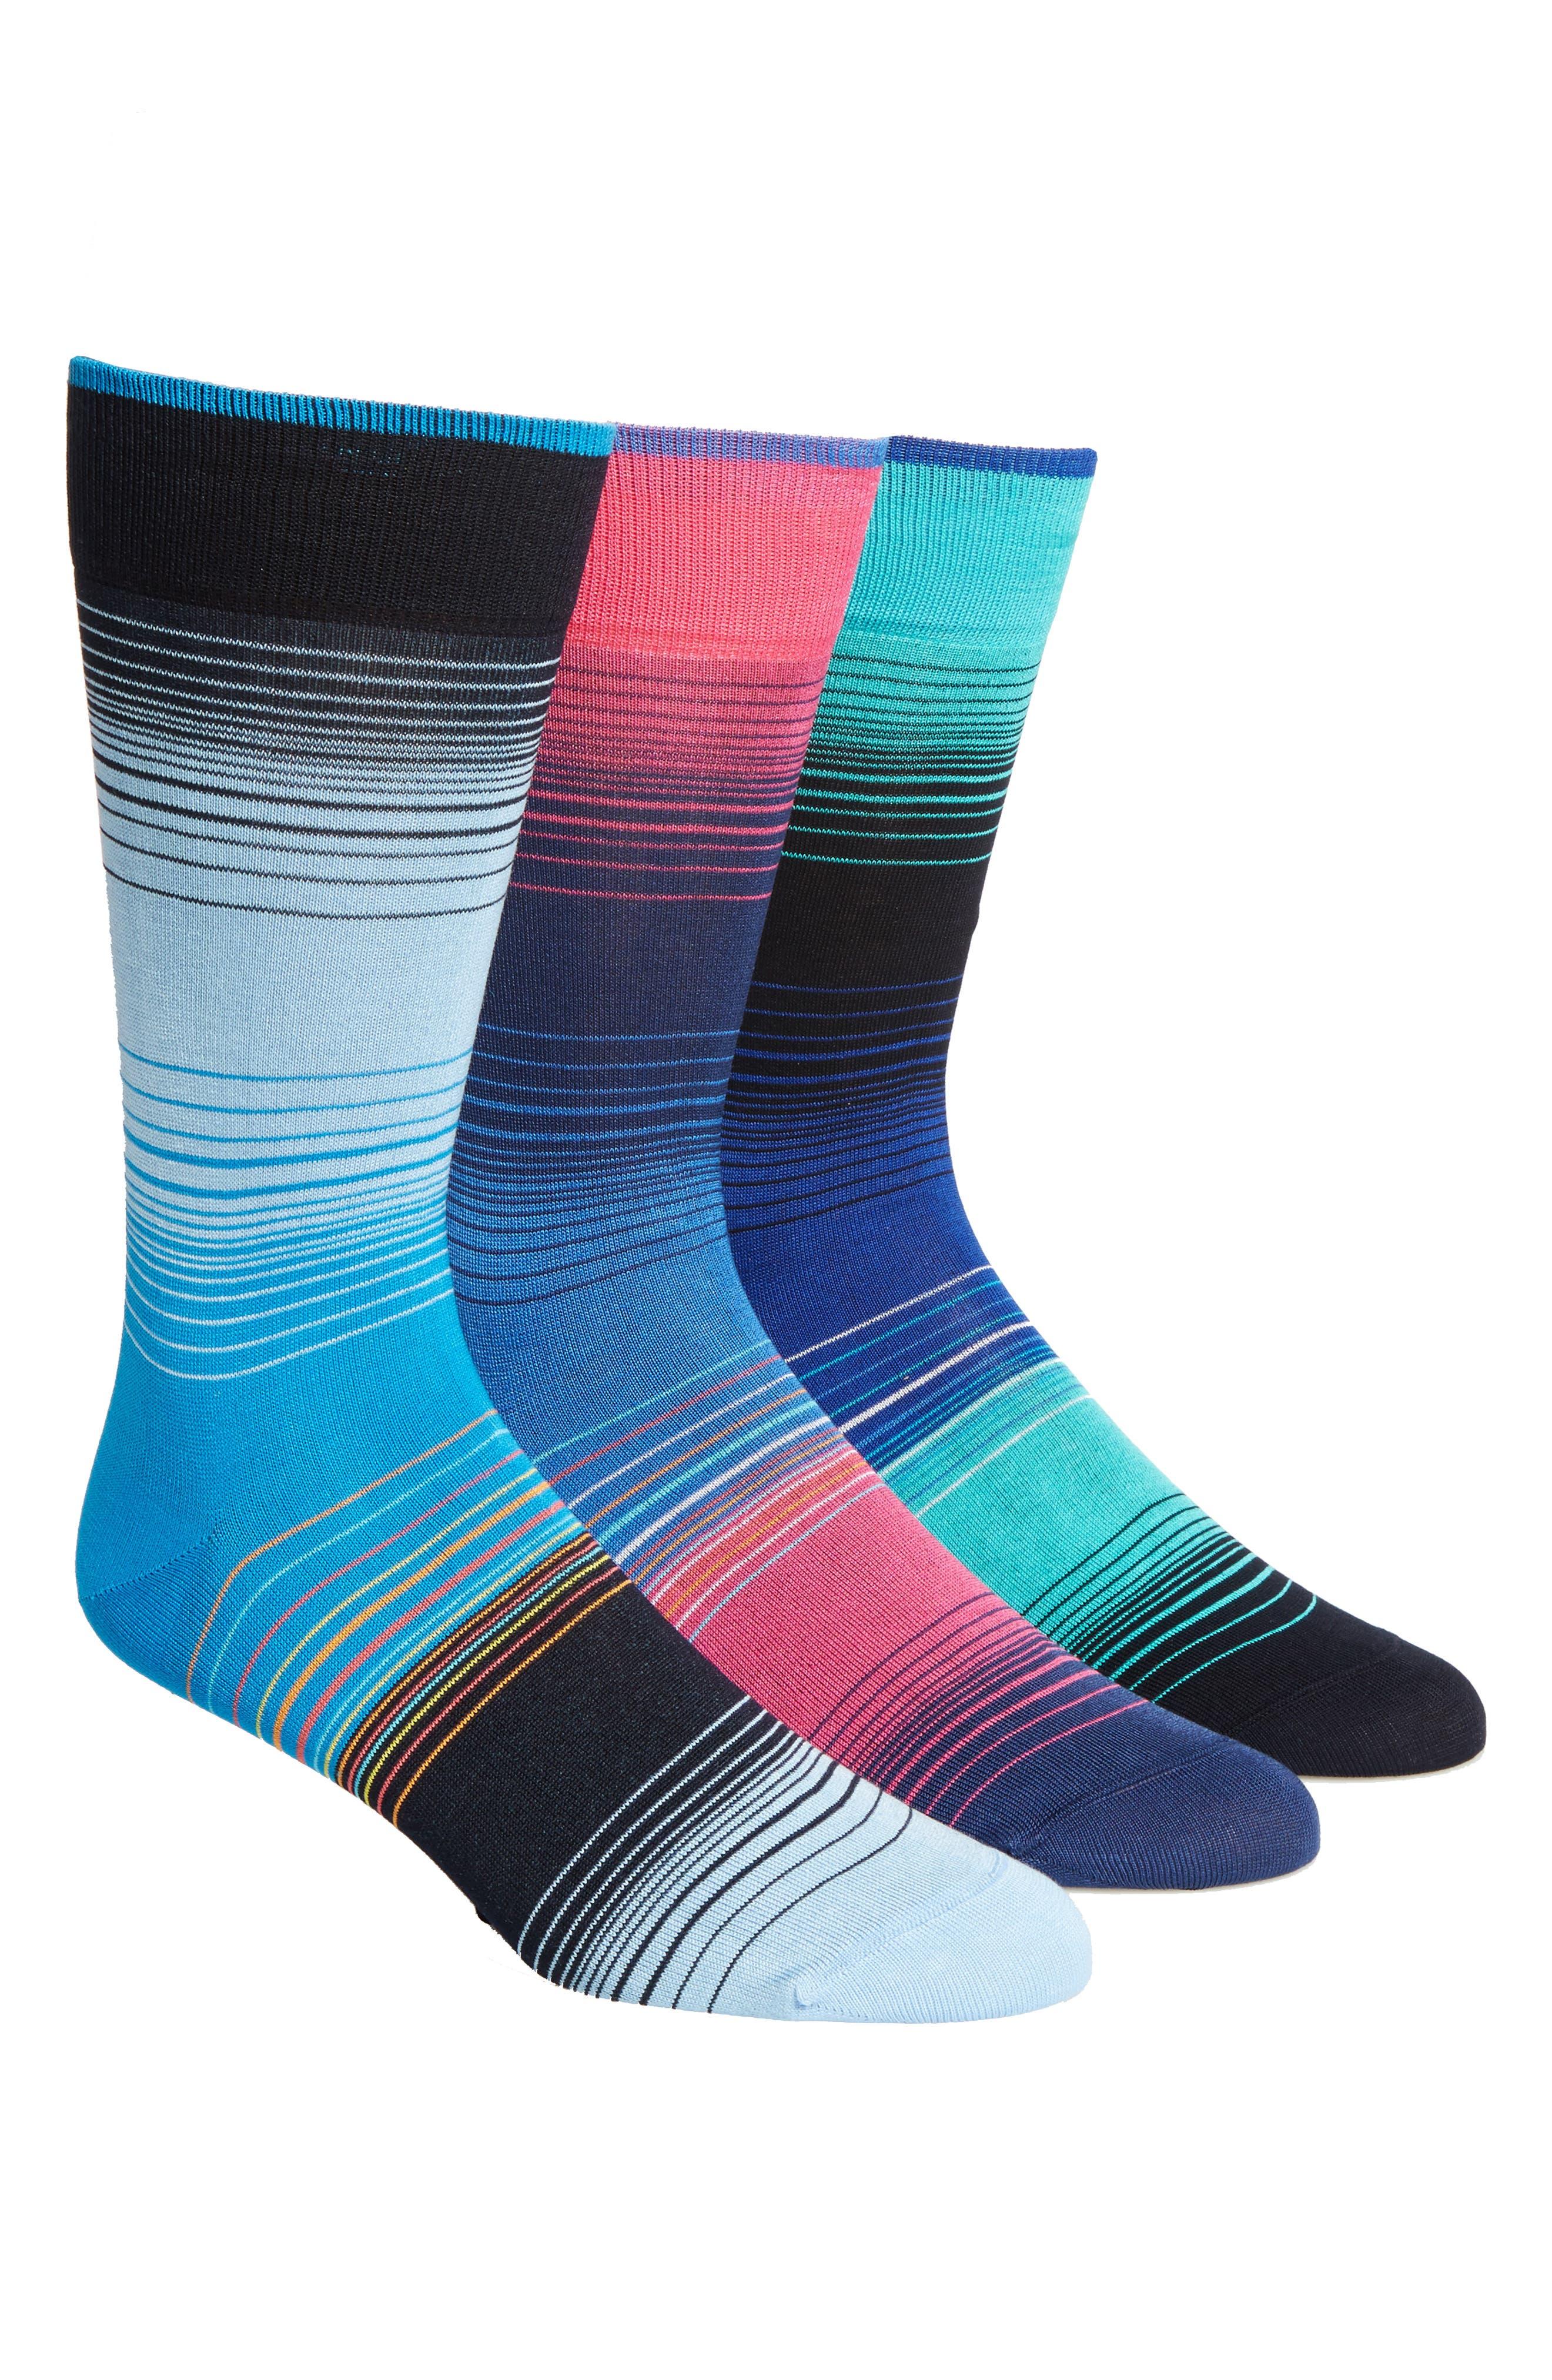 3-Pack Cotton Blend Socks,                             Main thumbnail 1, color,                             400